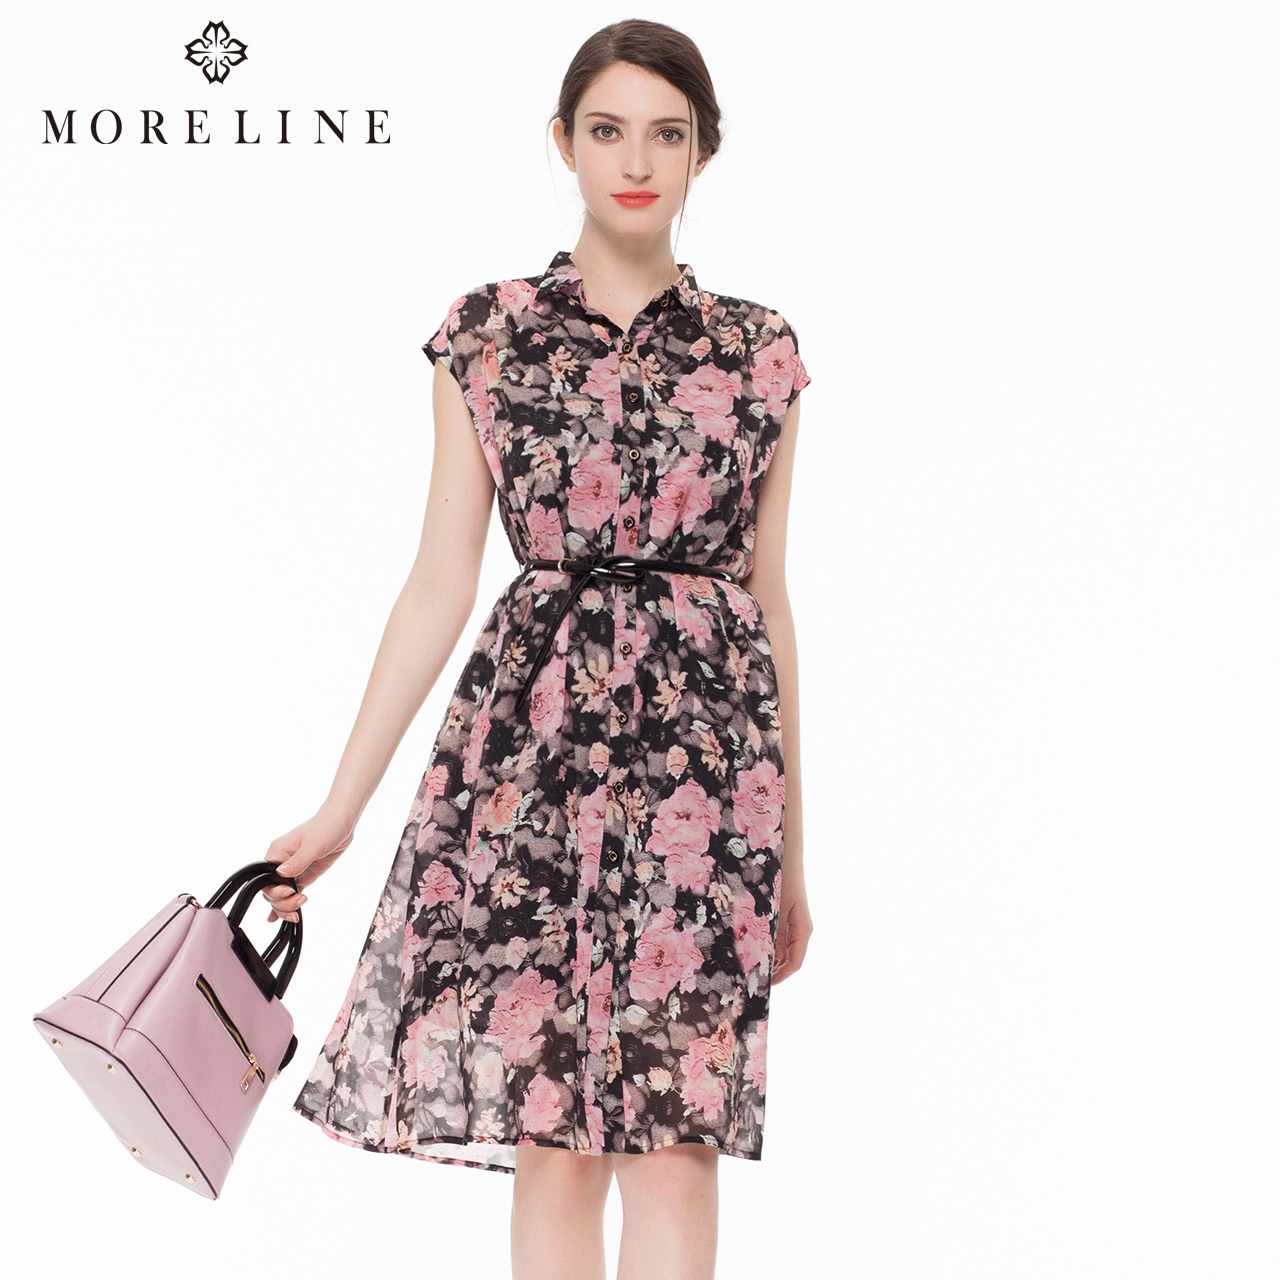 MORELINE沐兰夏季新款 时尚优雅印花无袖梭织真丝连衣裙女两件套